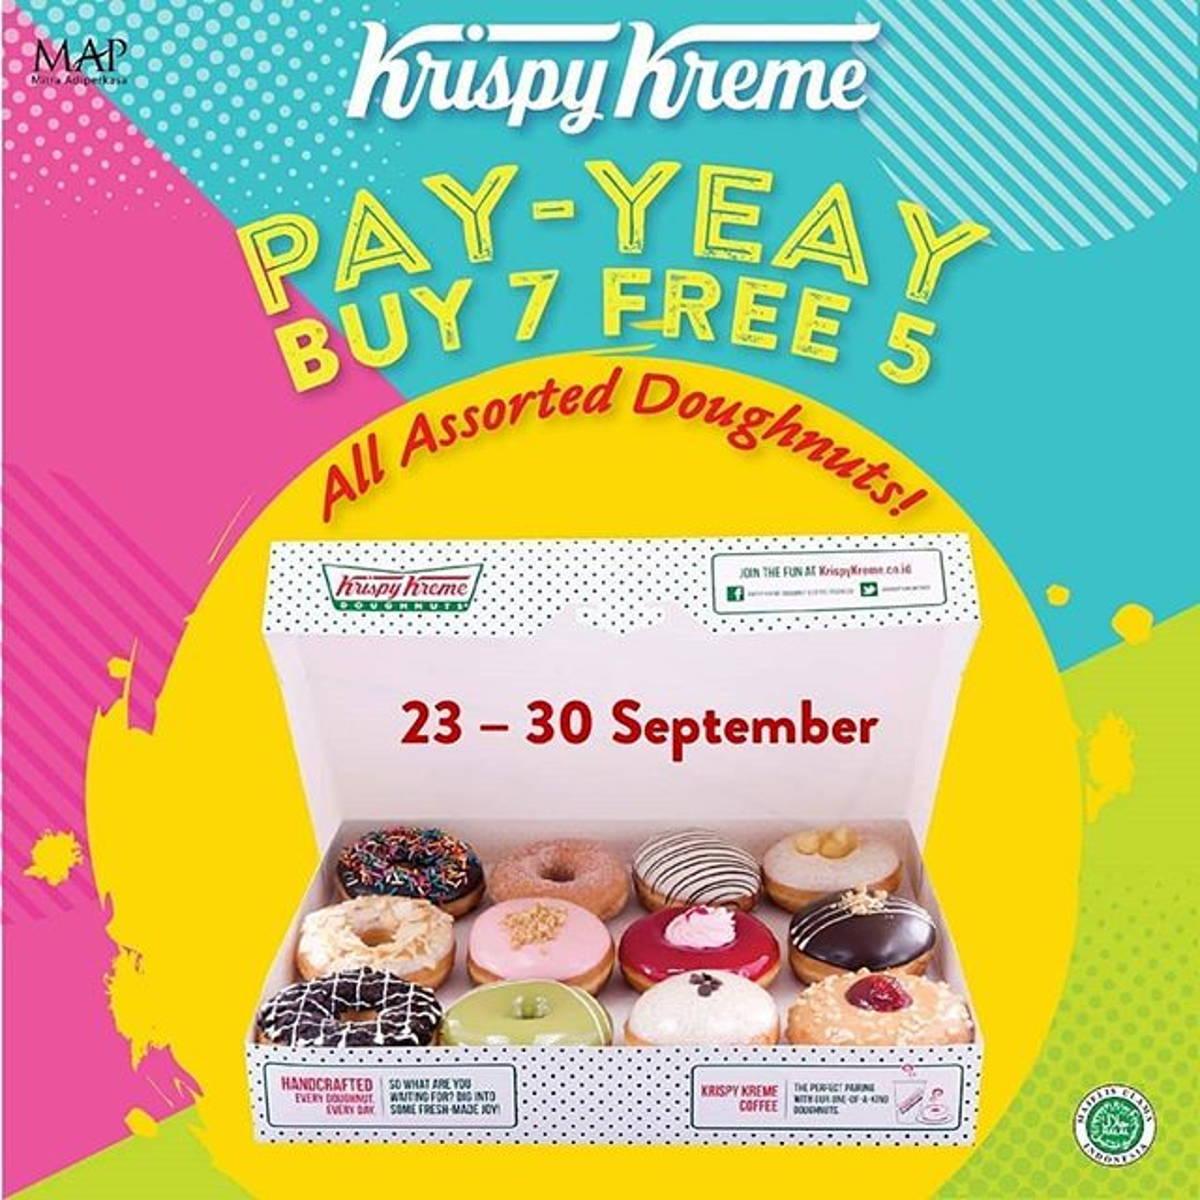 Katalog Promo: Krispy Kreme: PROMO PAY-YEAY Beli 7 FREE 5 ALL ASSORTED DOUGHNUT! - 1